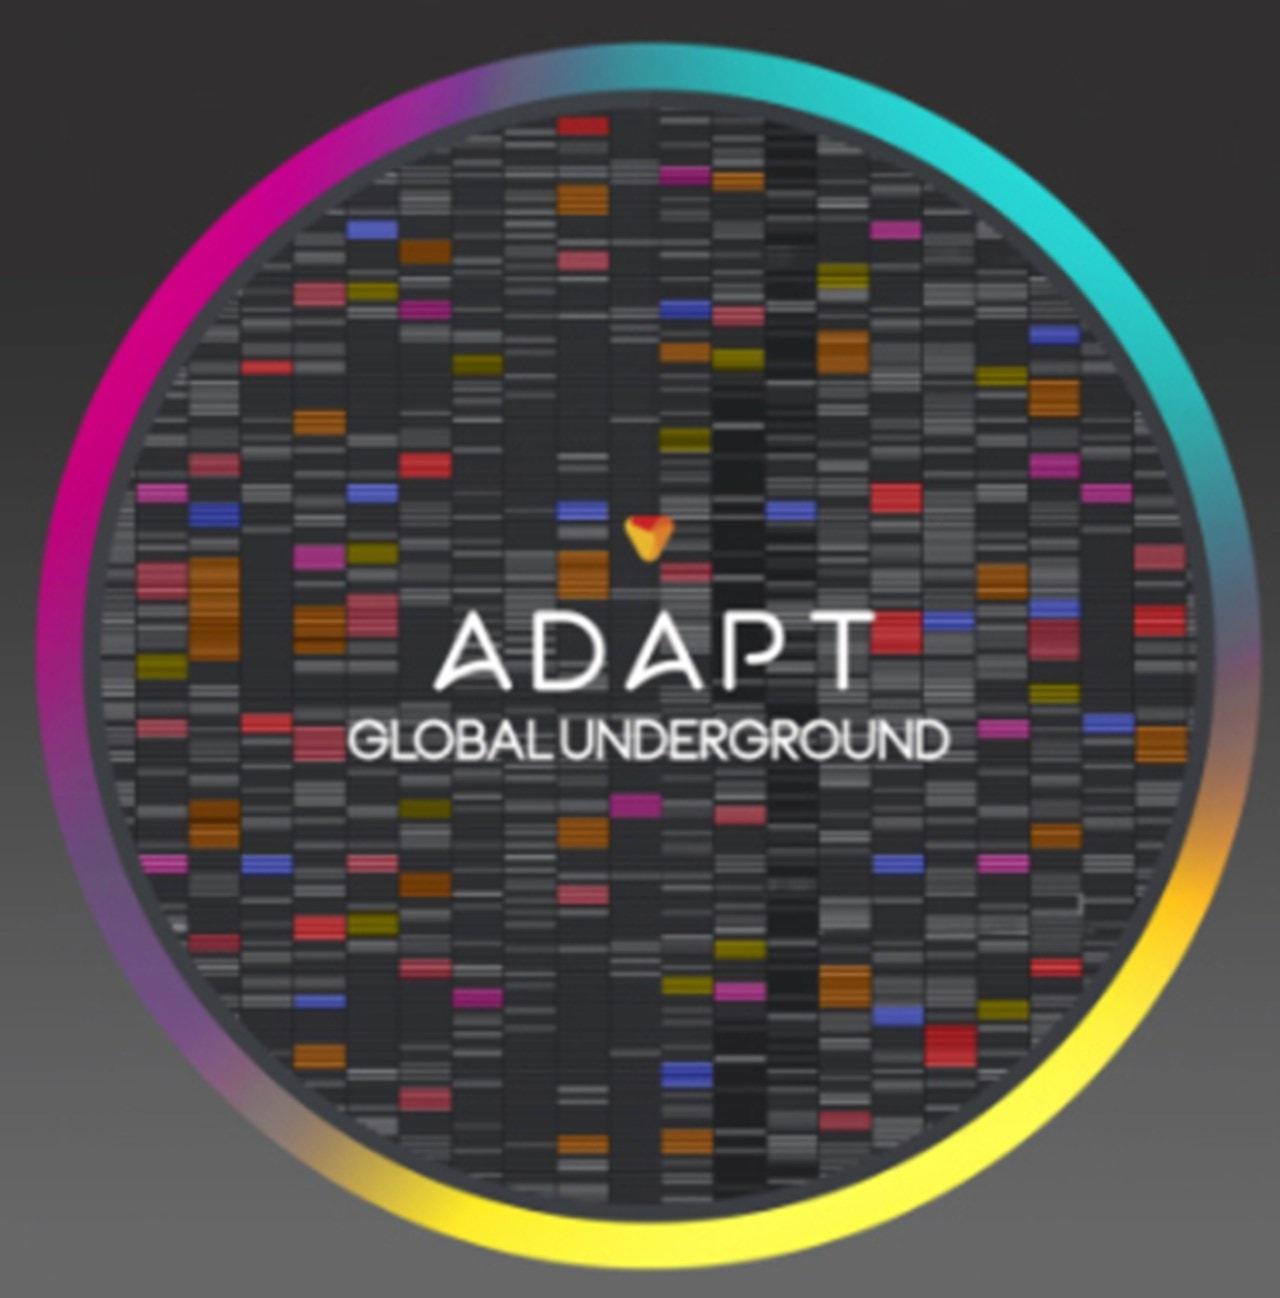 Global Underground: Adapt - 1